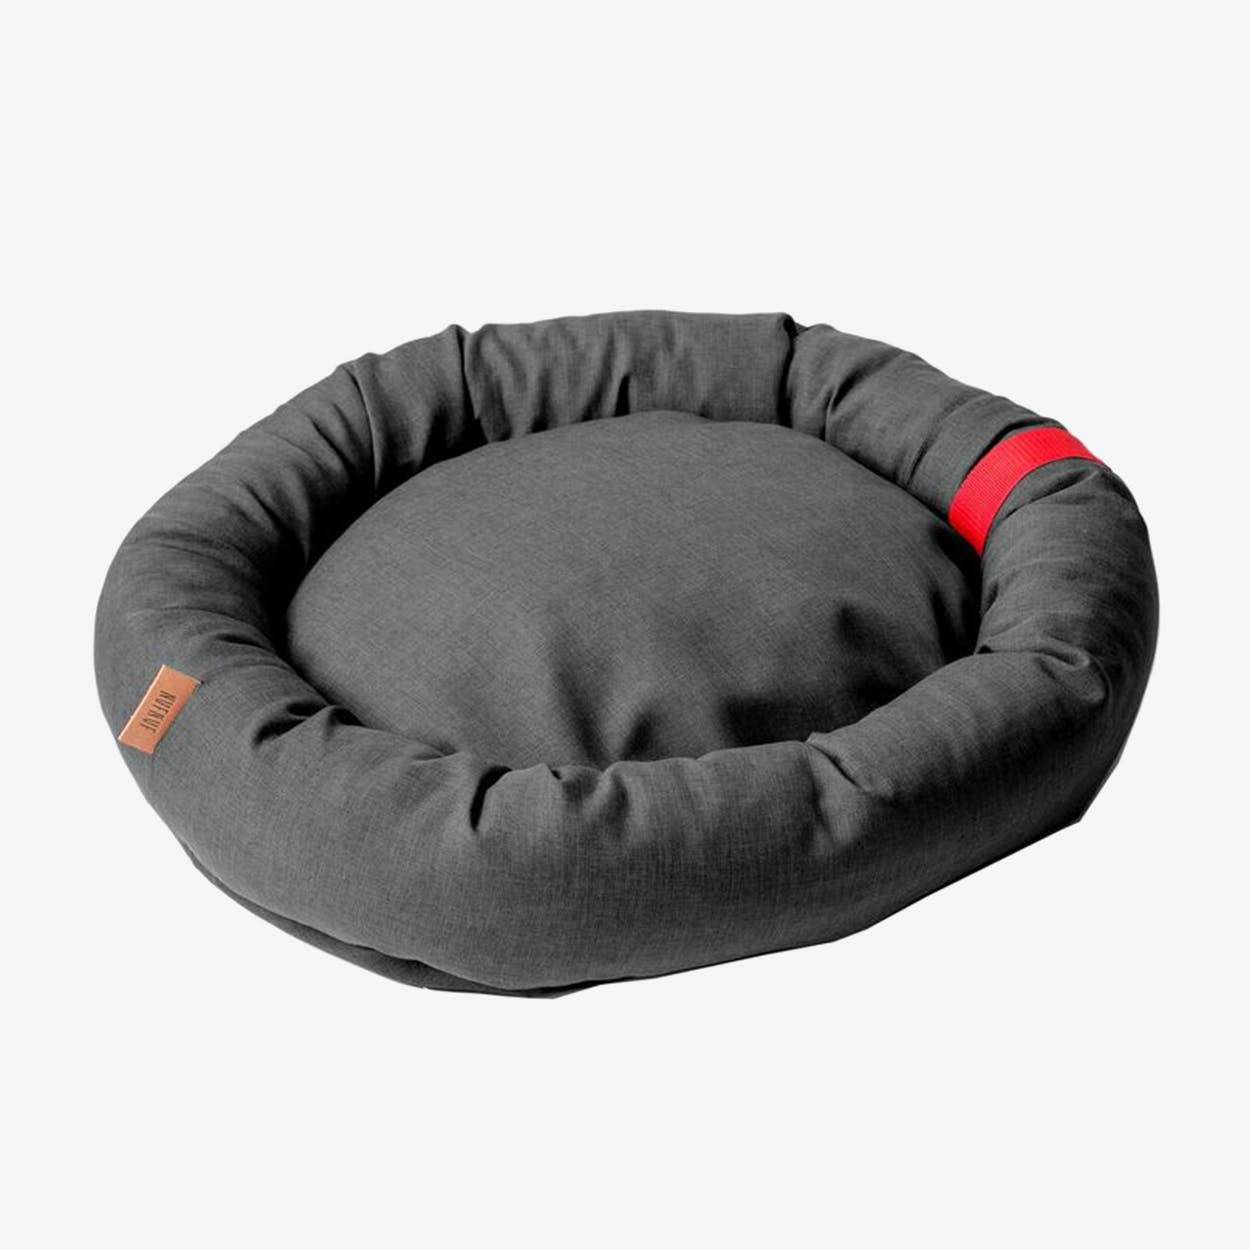 Buddy Bed in Dark Grey